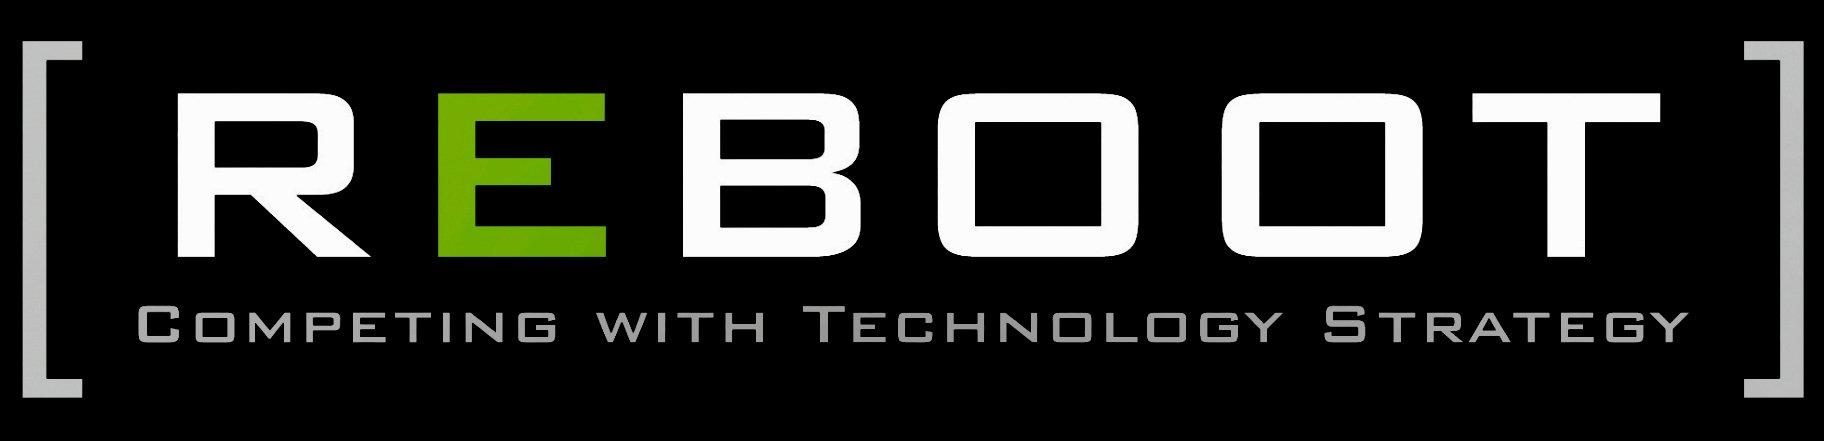 Did HBR read Reboot?